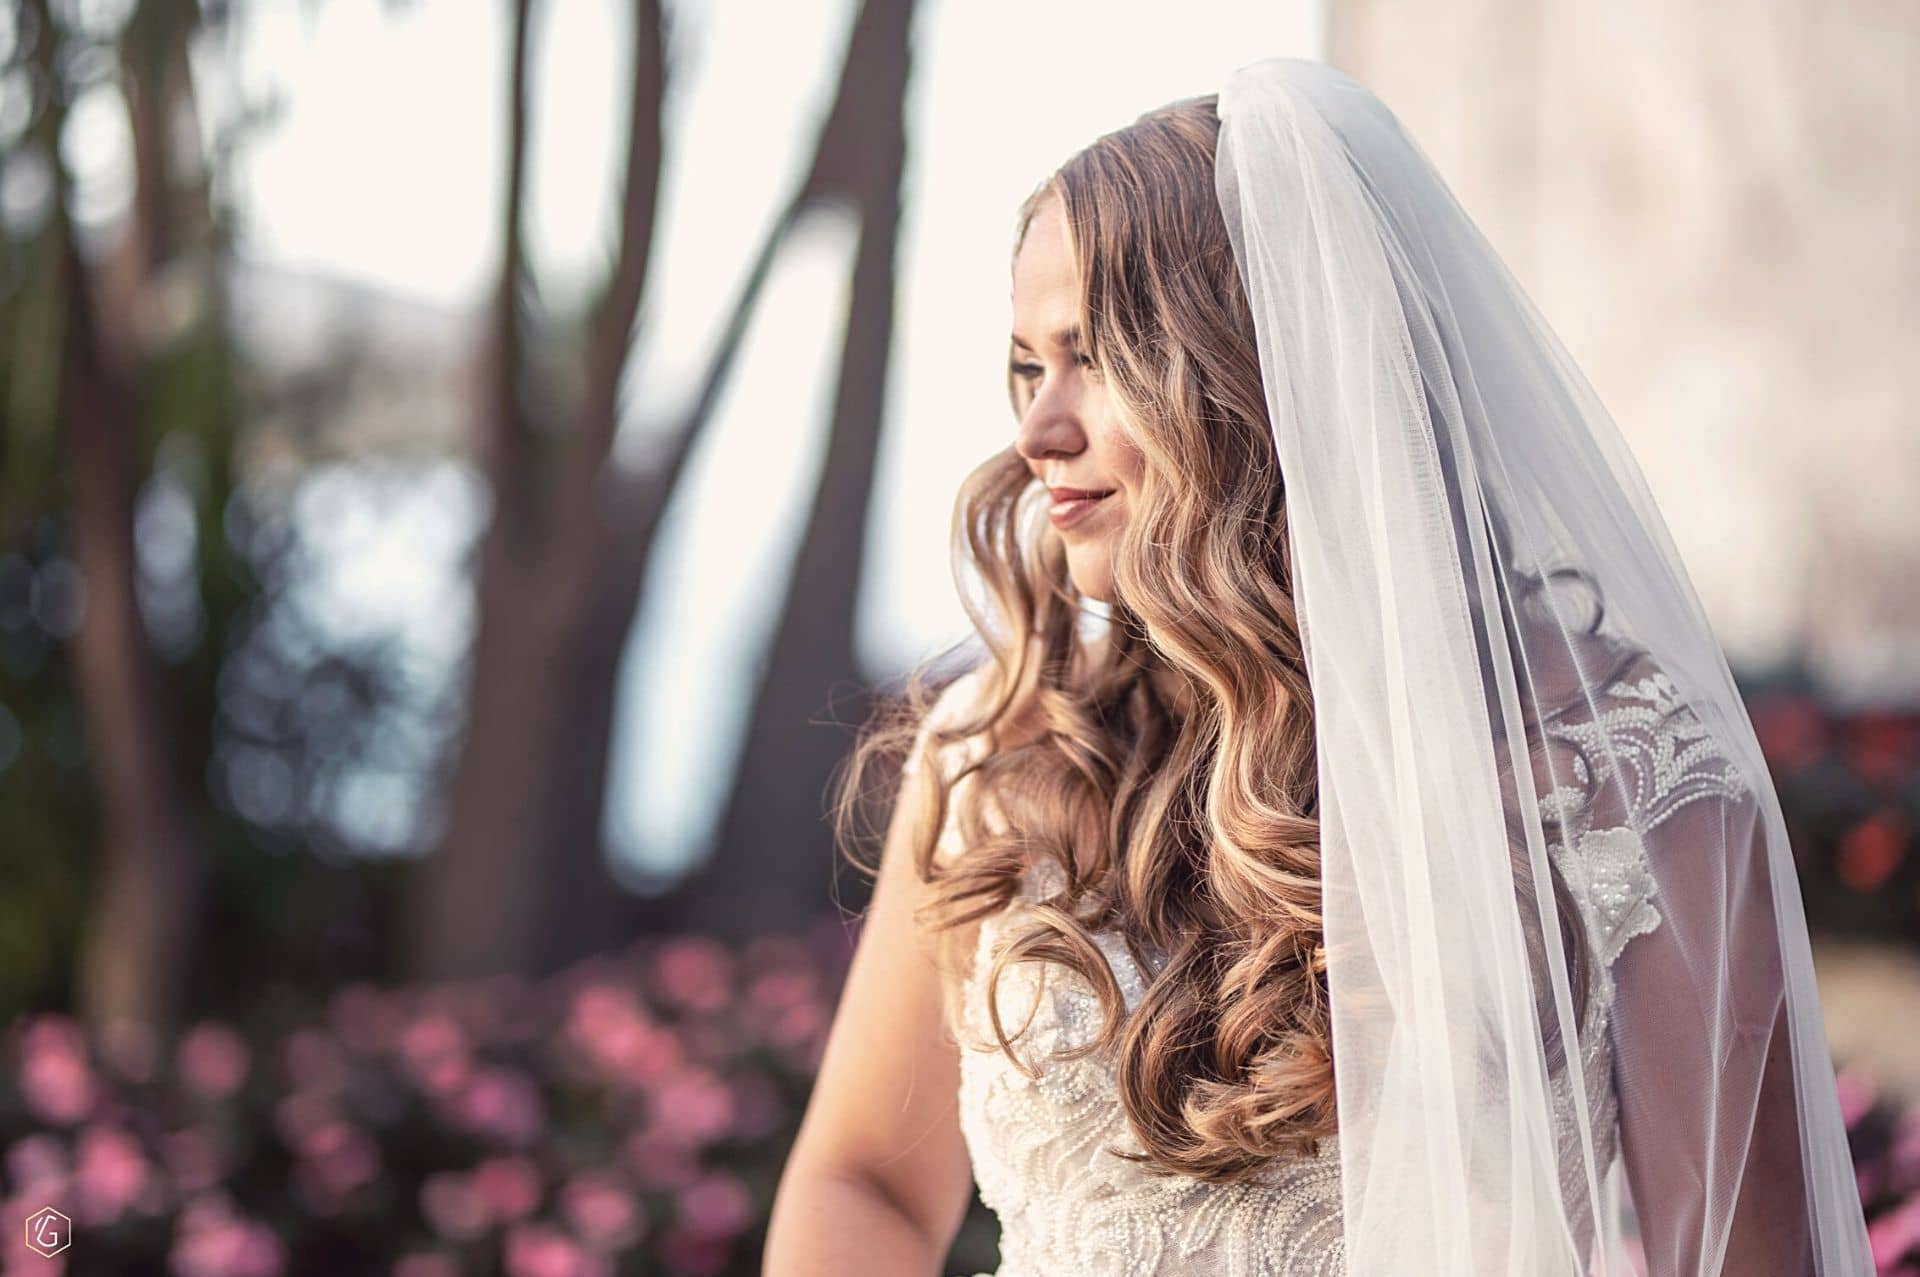 Vilma weddind and event planner vestuvės 2021 santuoka Italijoje vestuvių planuotoja Vilma Rapšaitė